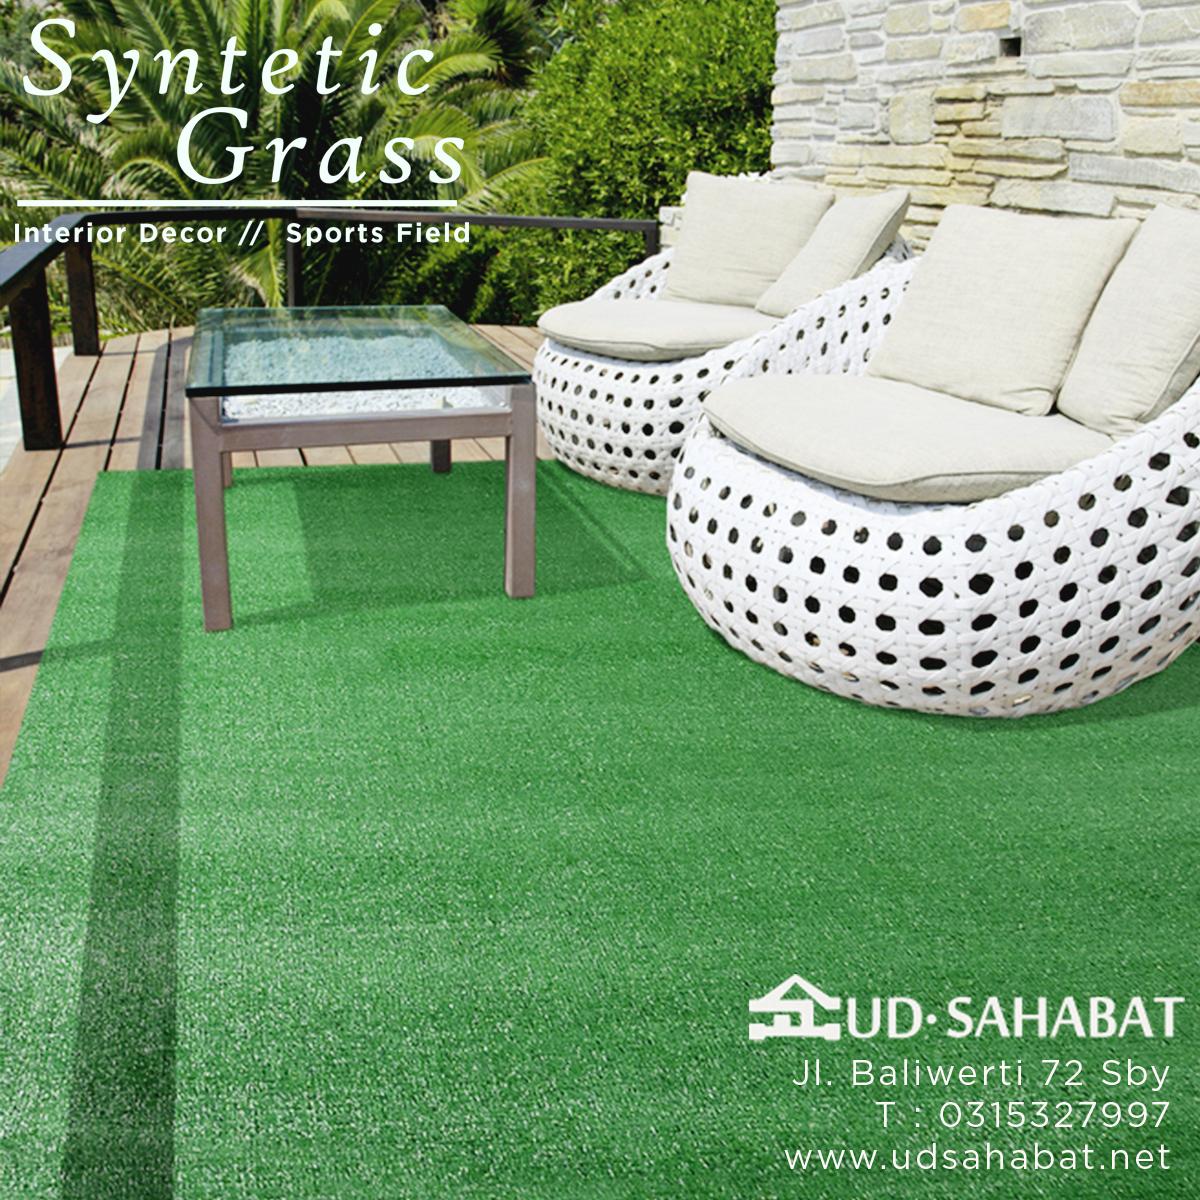 toko jual ready rumput sintetis palsu buatan murah ud sahabat baliwerti surabaya